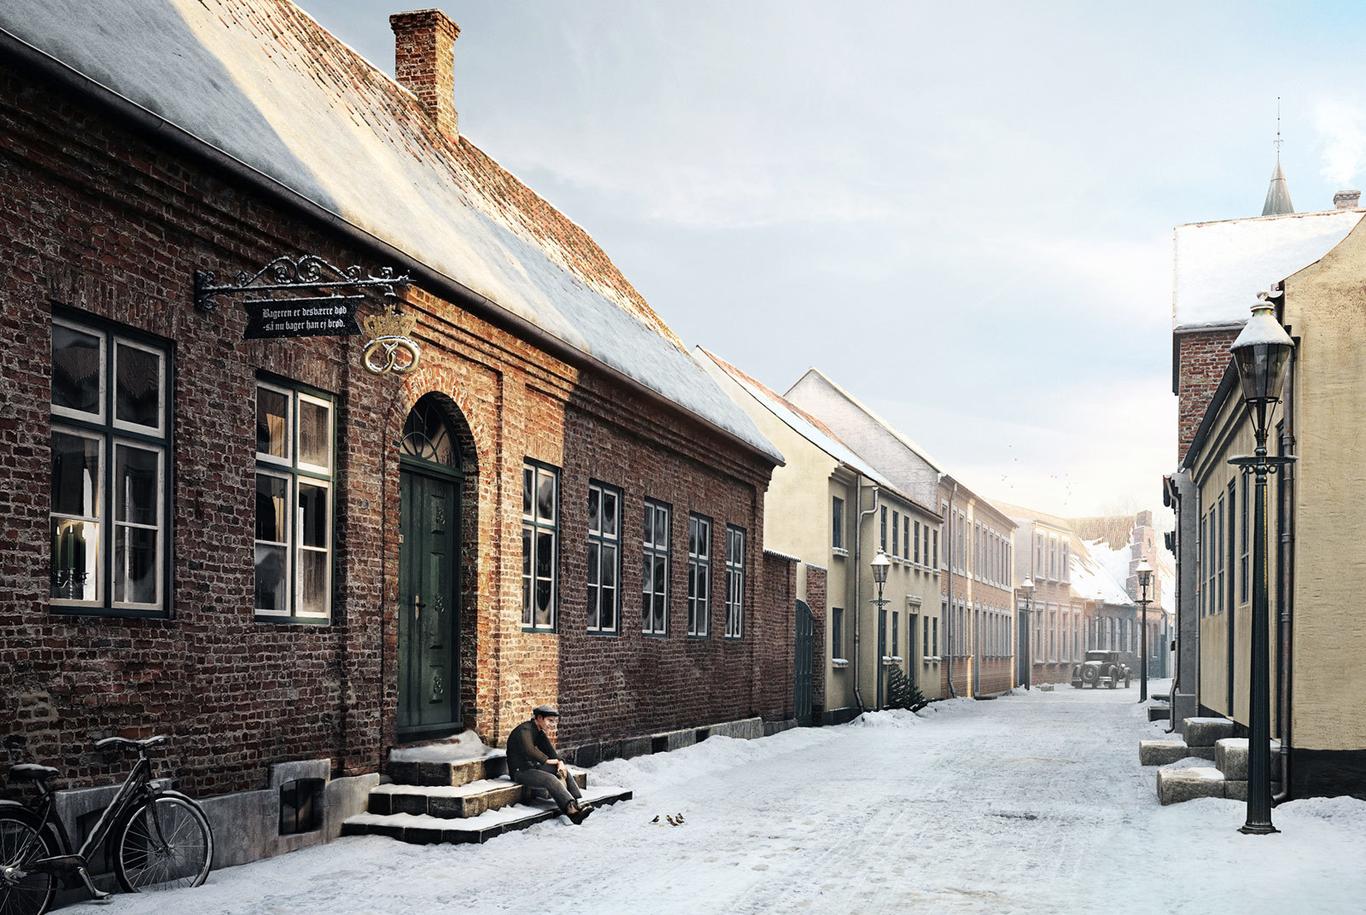 Latter winter street 1 07b17101 c6bh